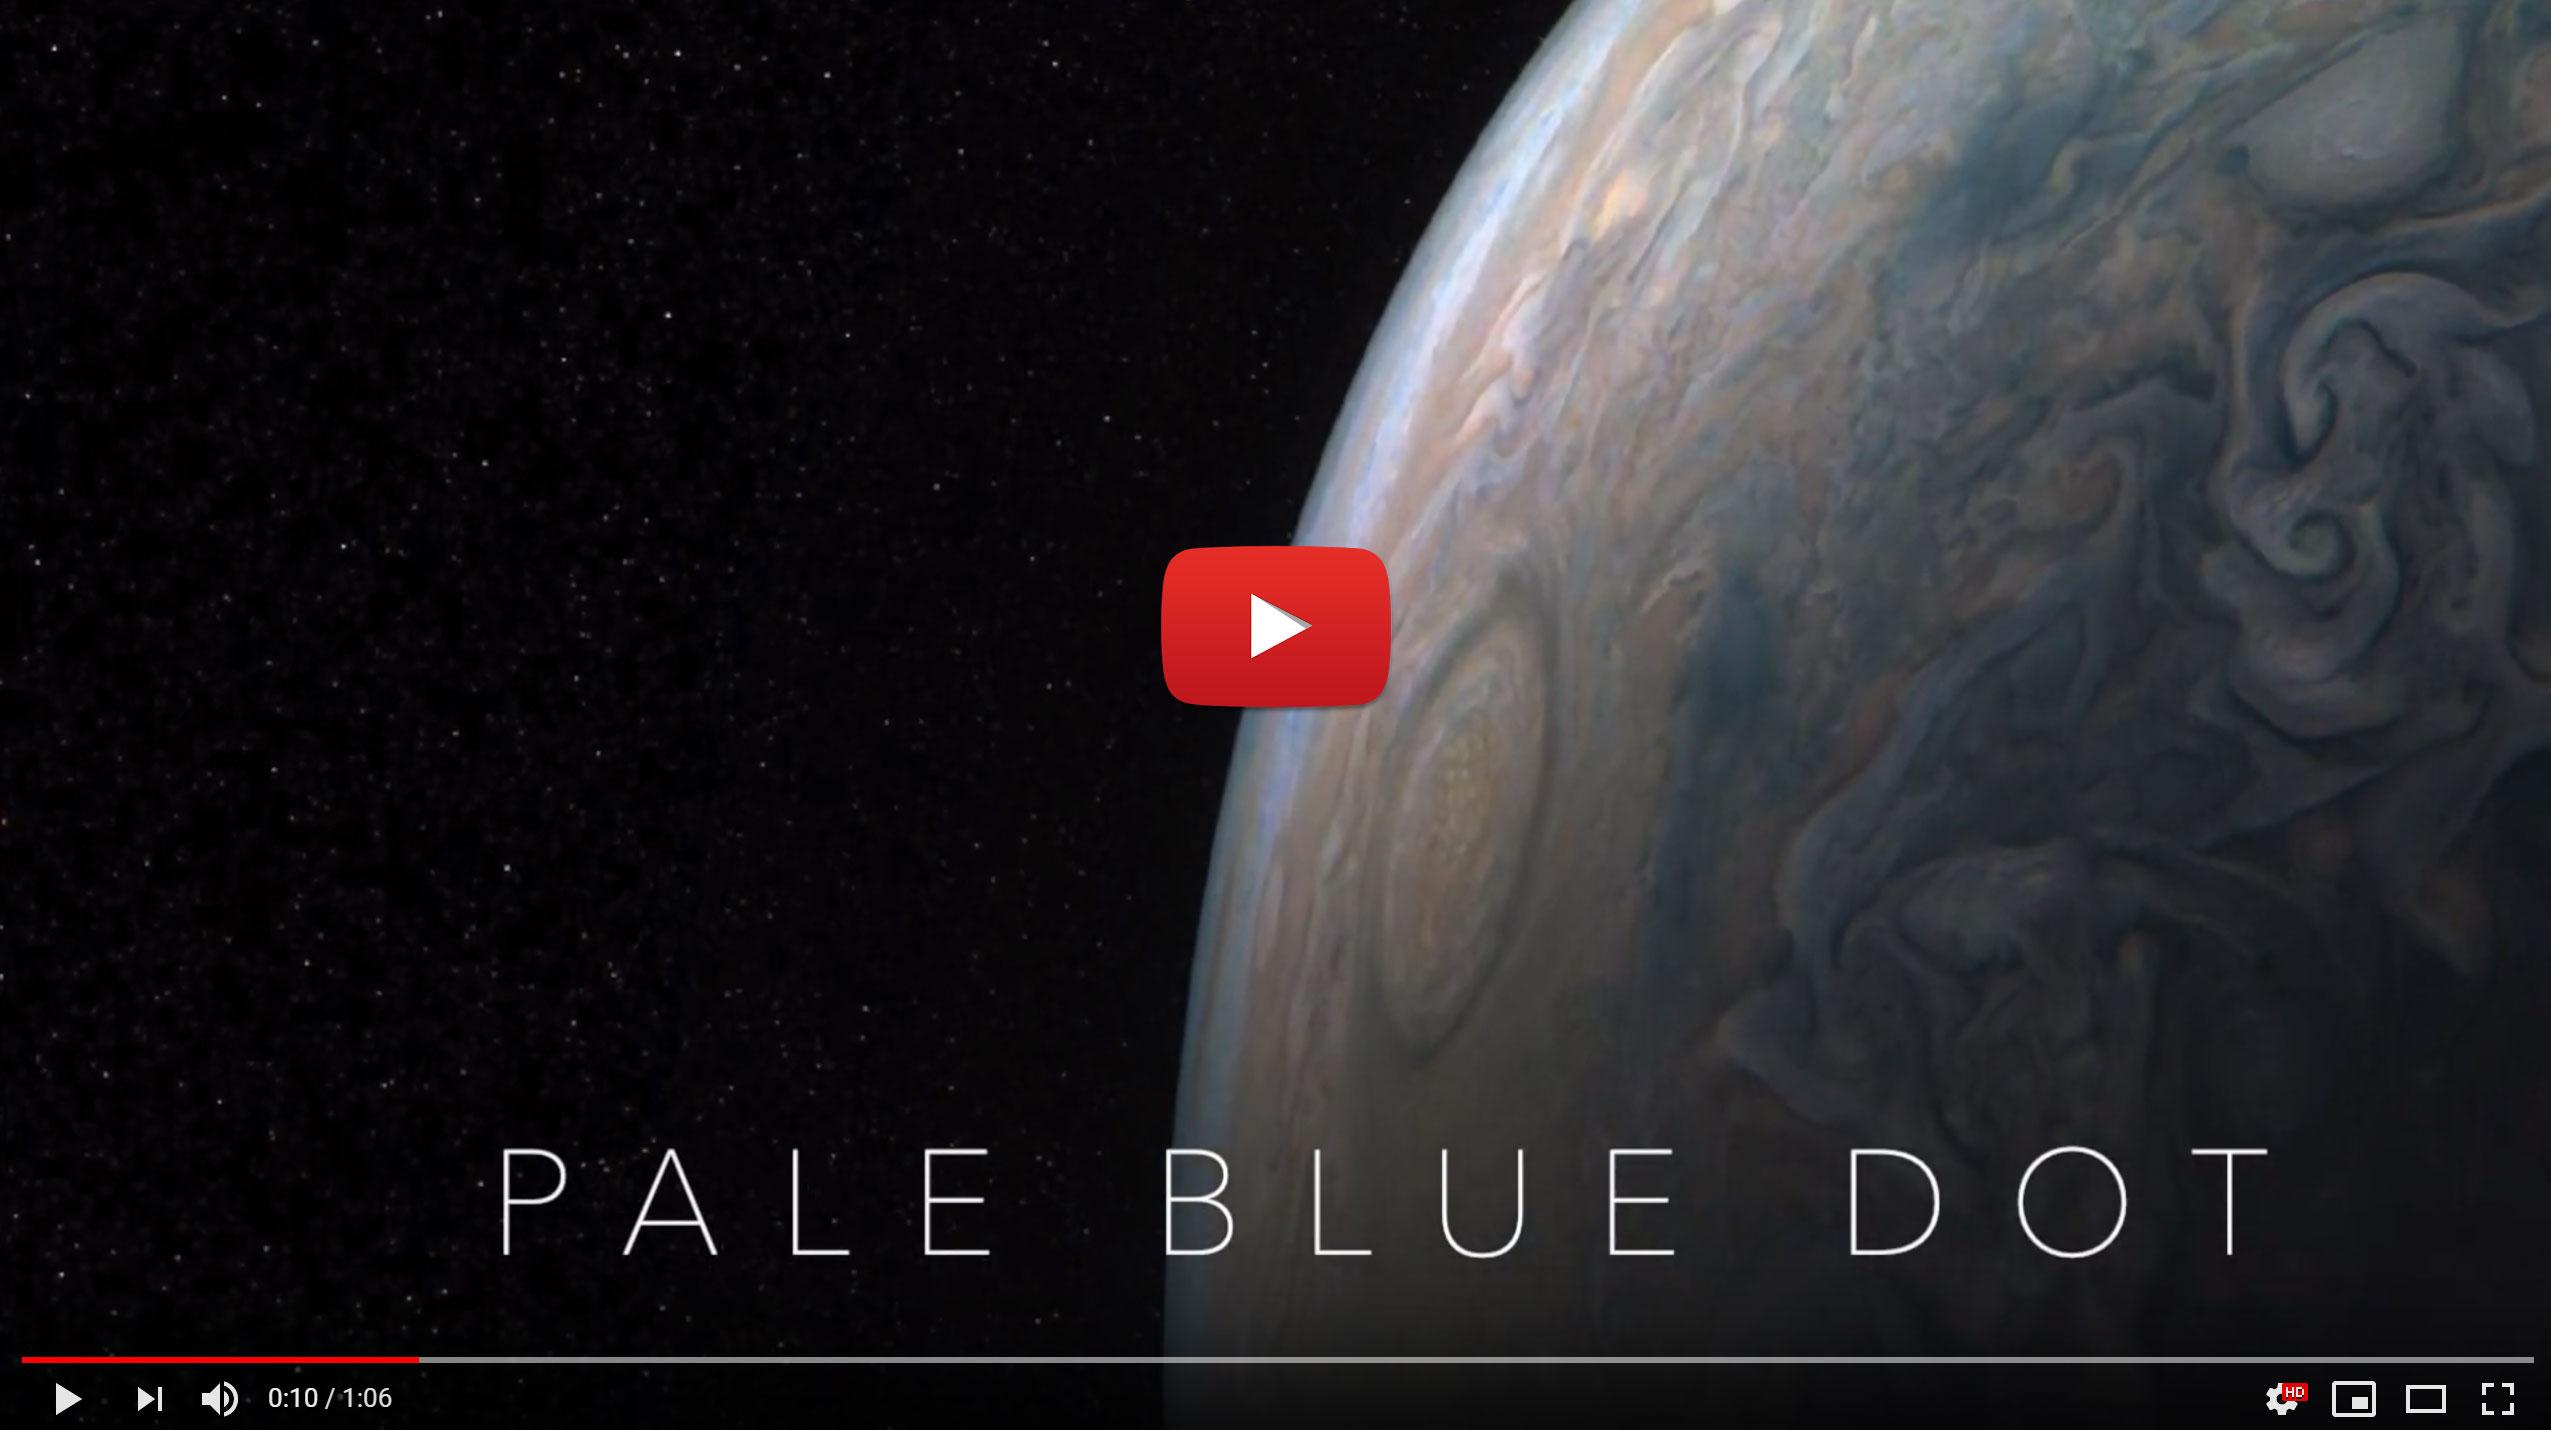 PALE BLUE DOT – PALLIDO PALLINO BLU (Trailer)